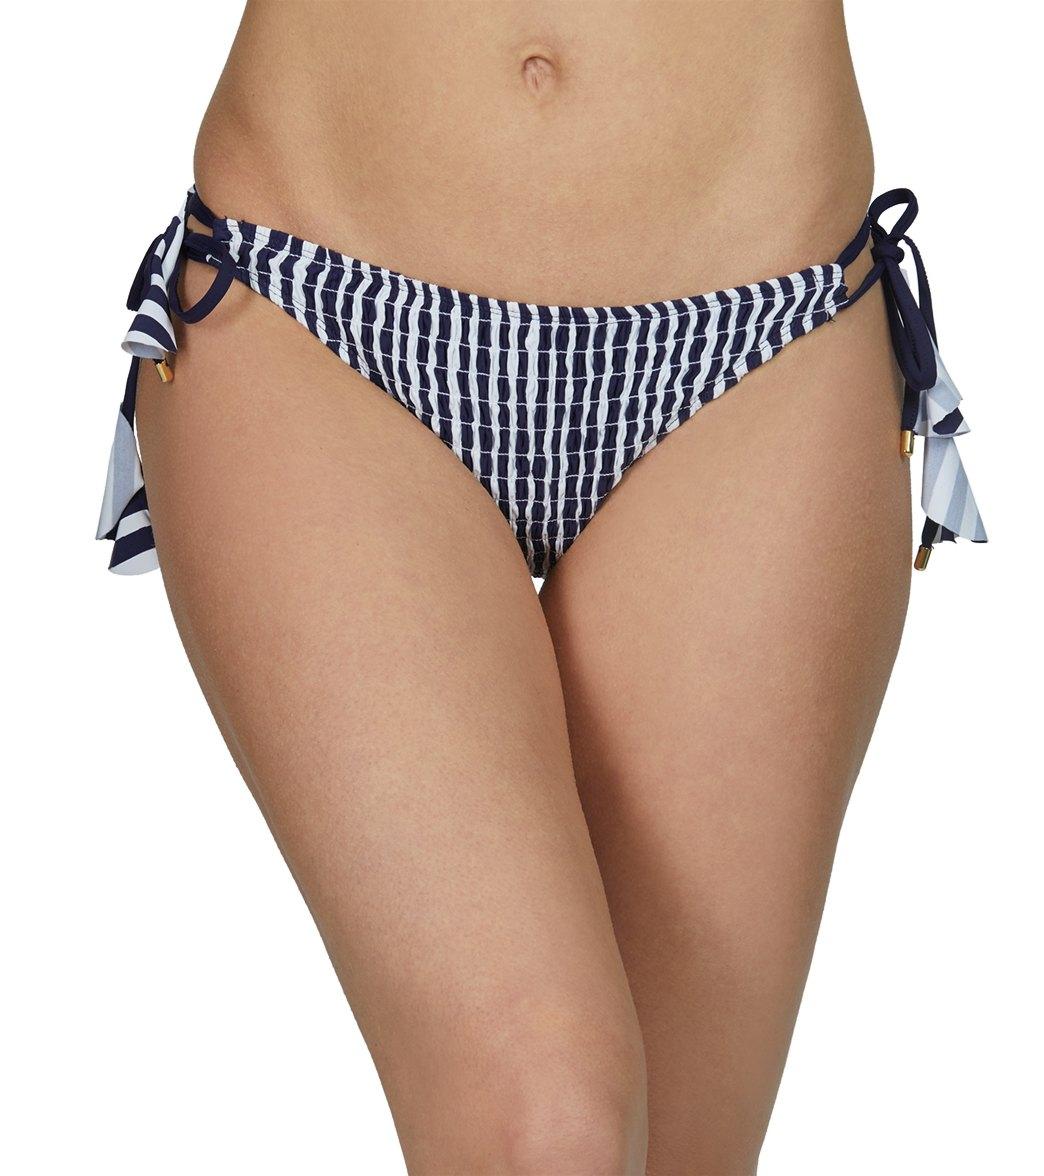 Anne Cole Don't Smock Me Loop String Bikini Bottom